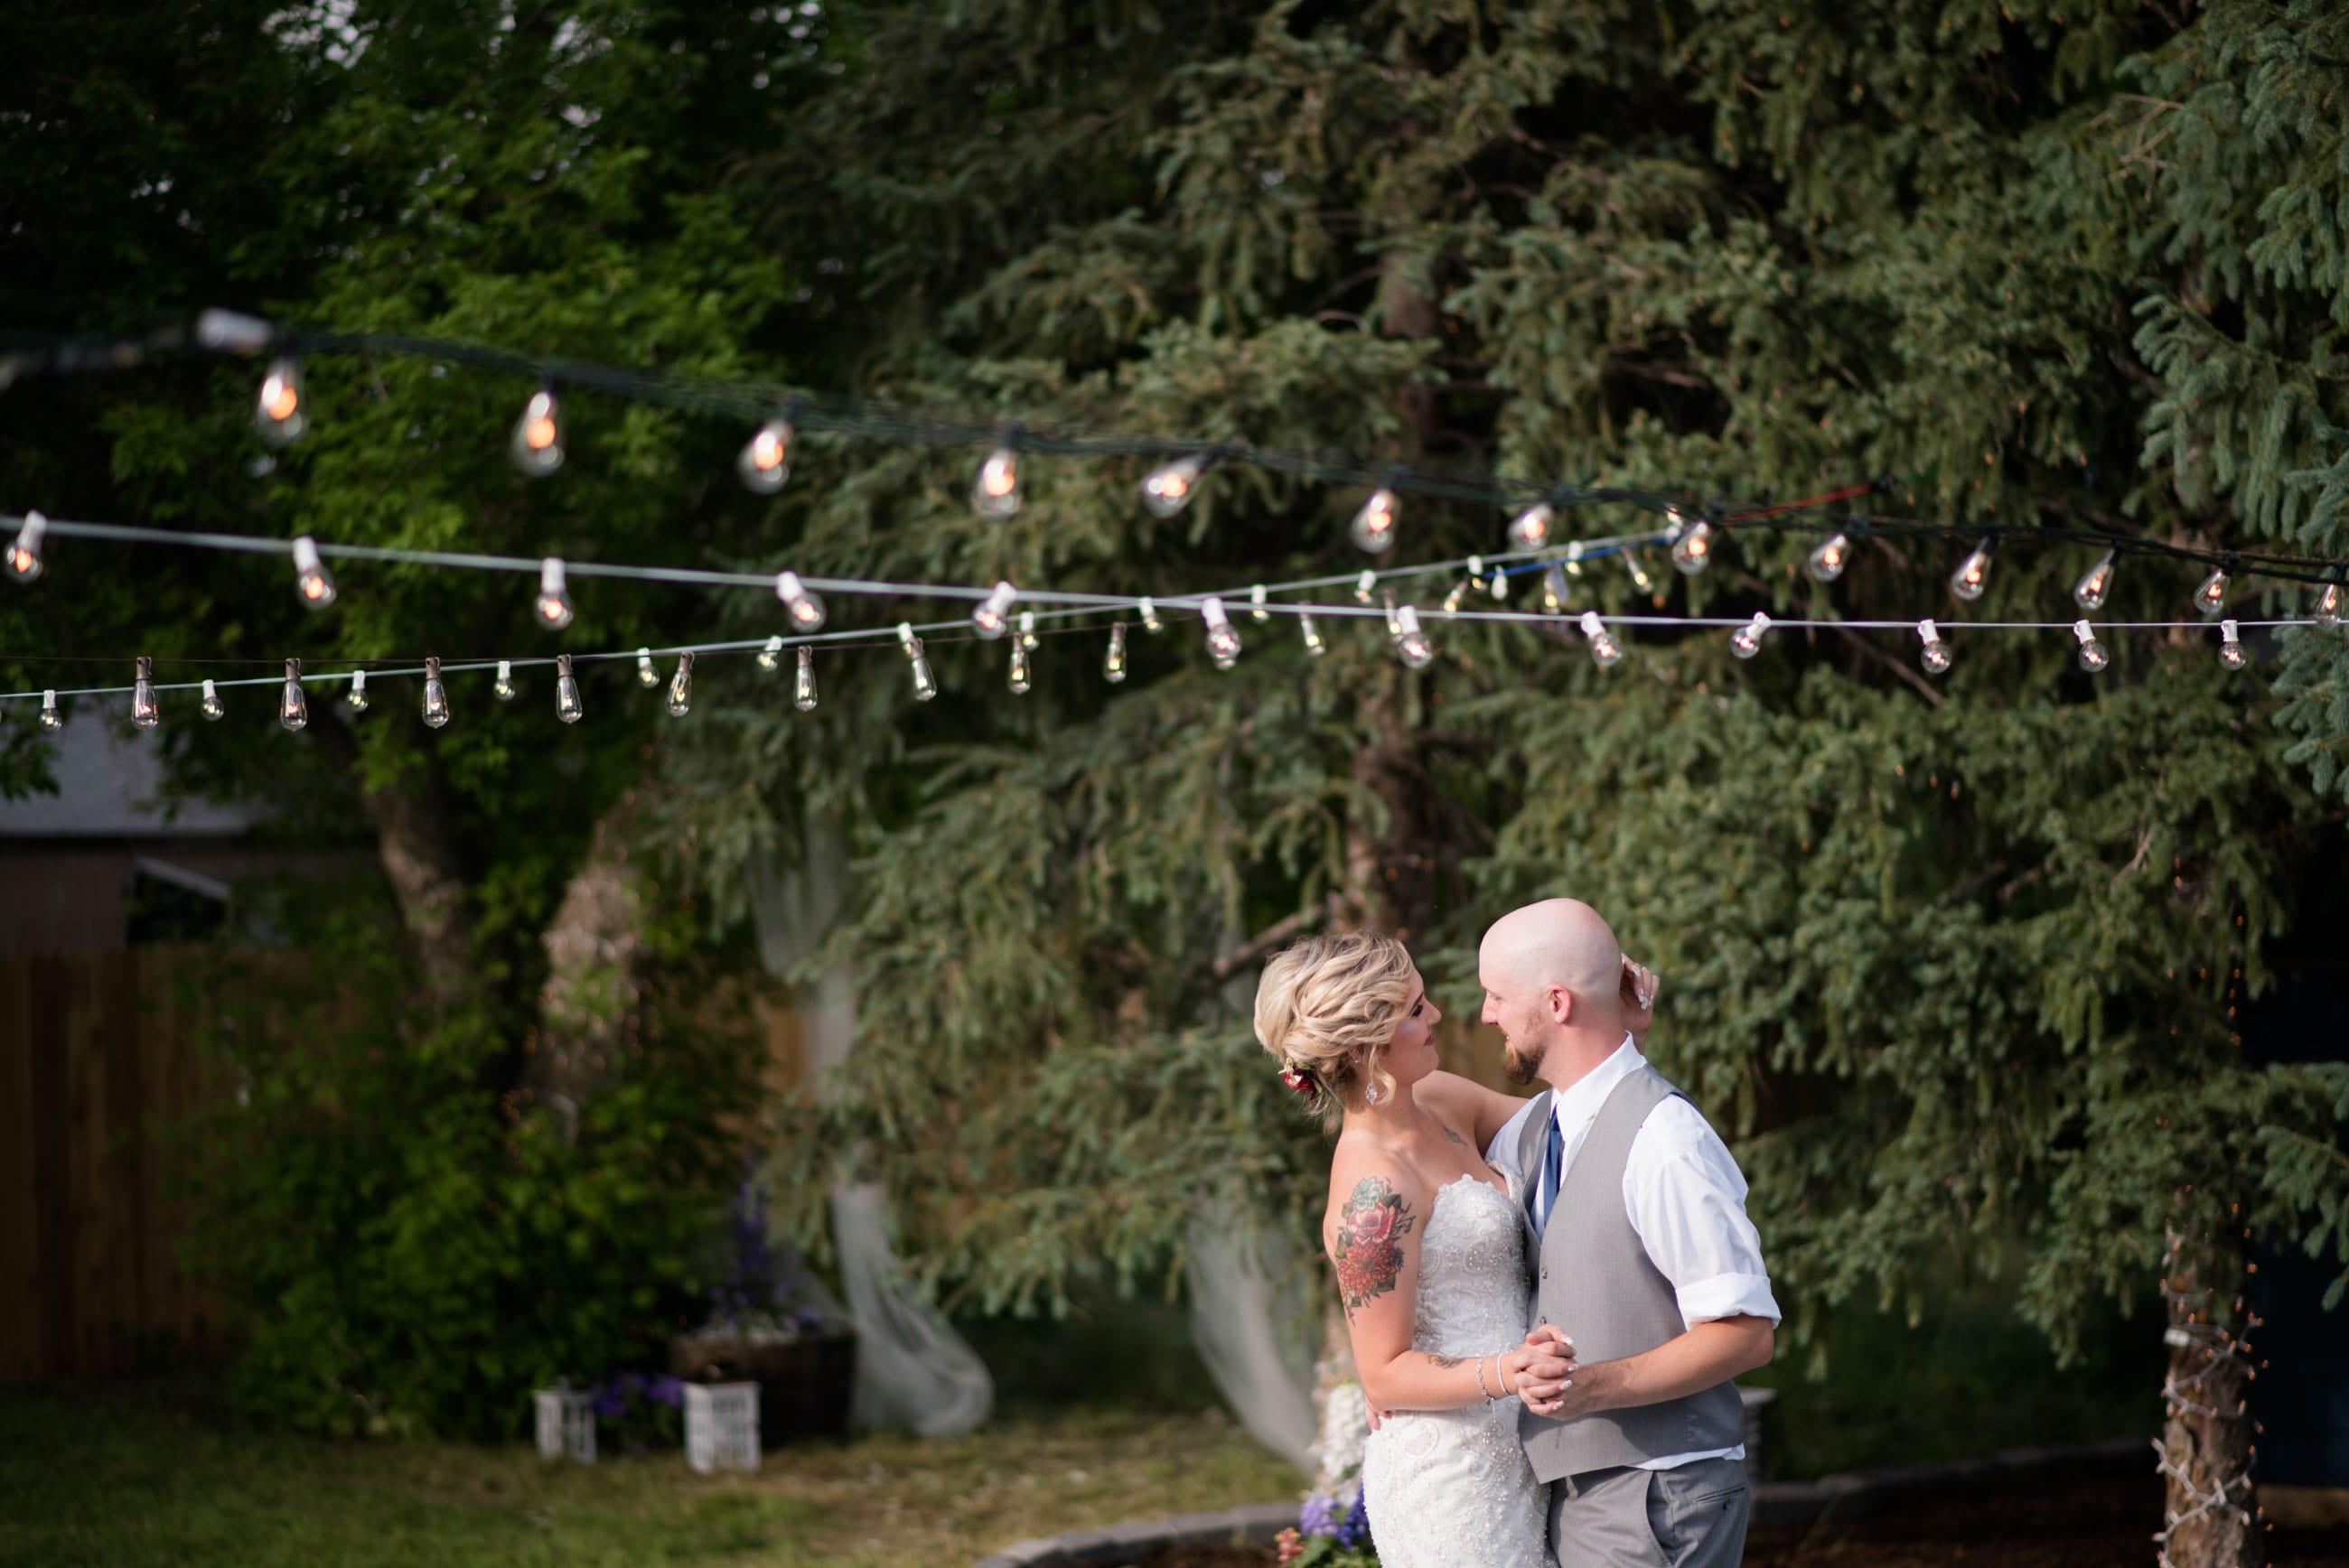 Backyard Wedding | Fort Collins, Co | Fort Collins Wedding Photographer